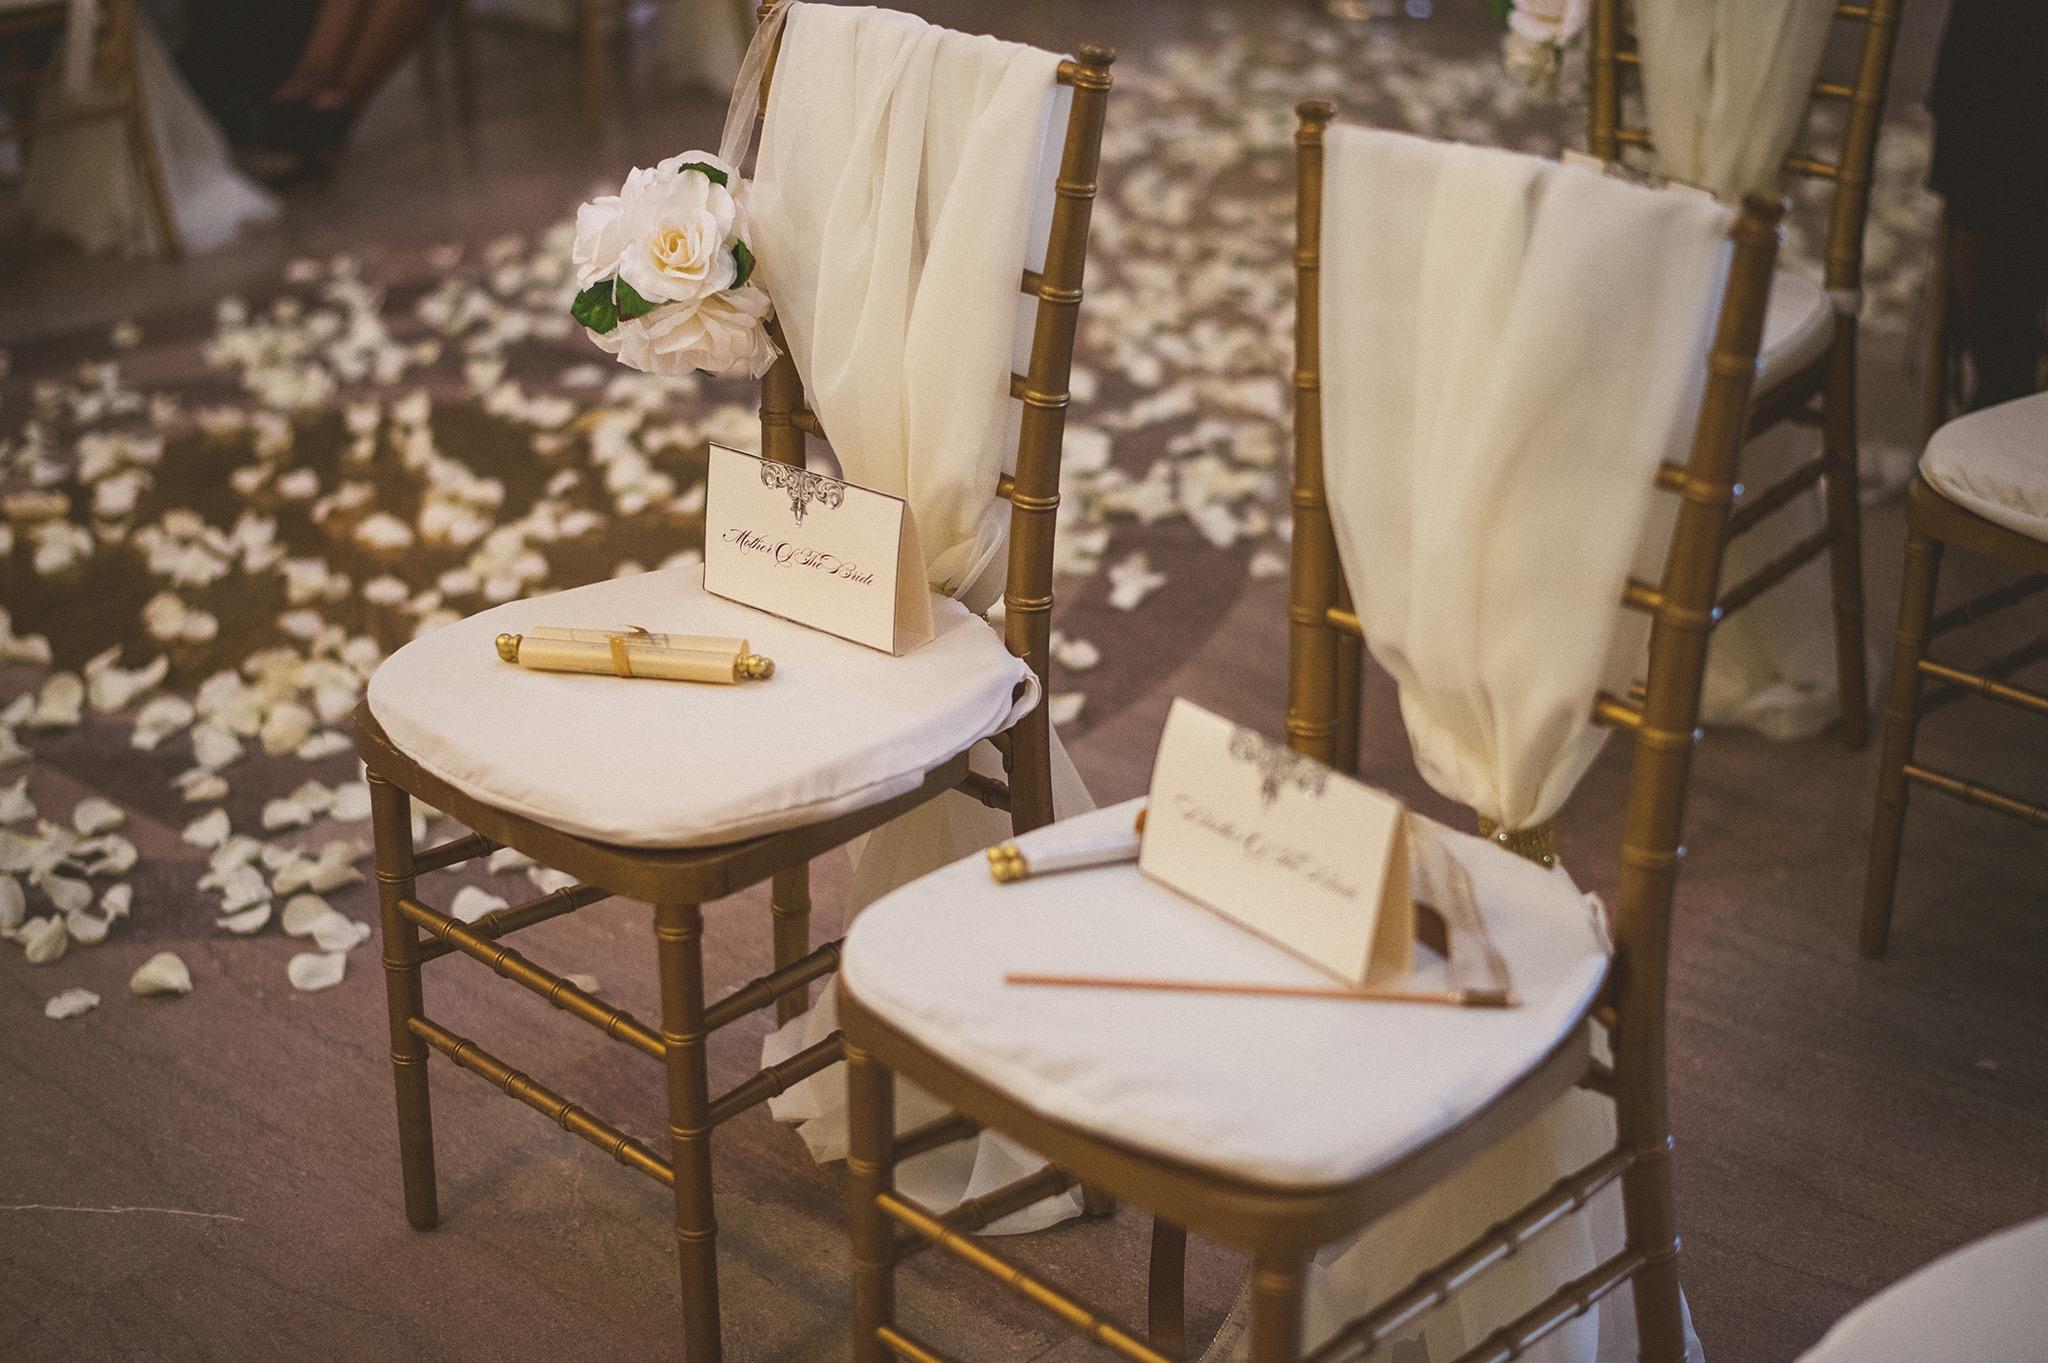 35-handmade-wedding-chairs.jpg